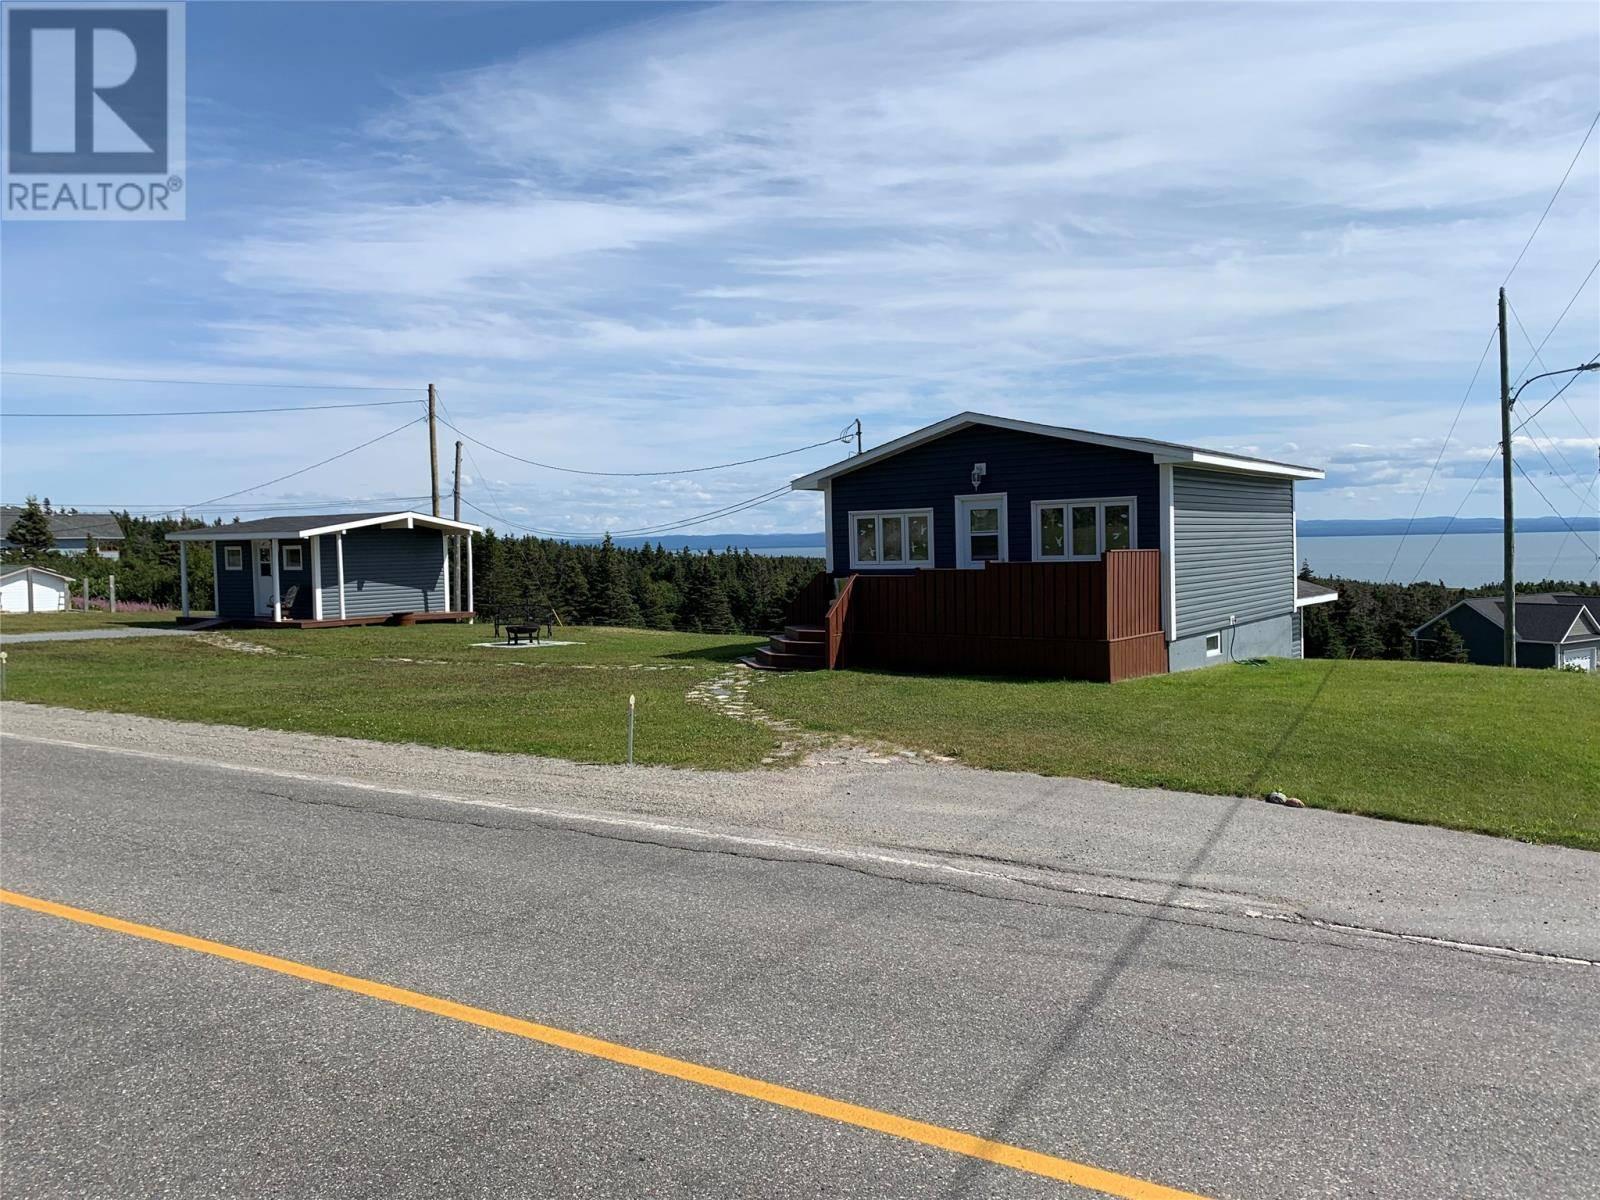 House for sale at 365 Kippens Rd Kippens Newfoundland - MLS: 1200930